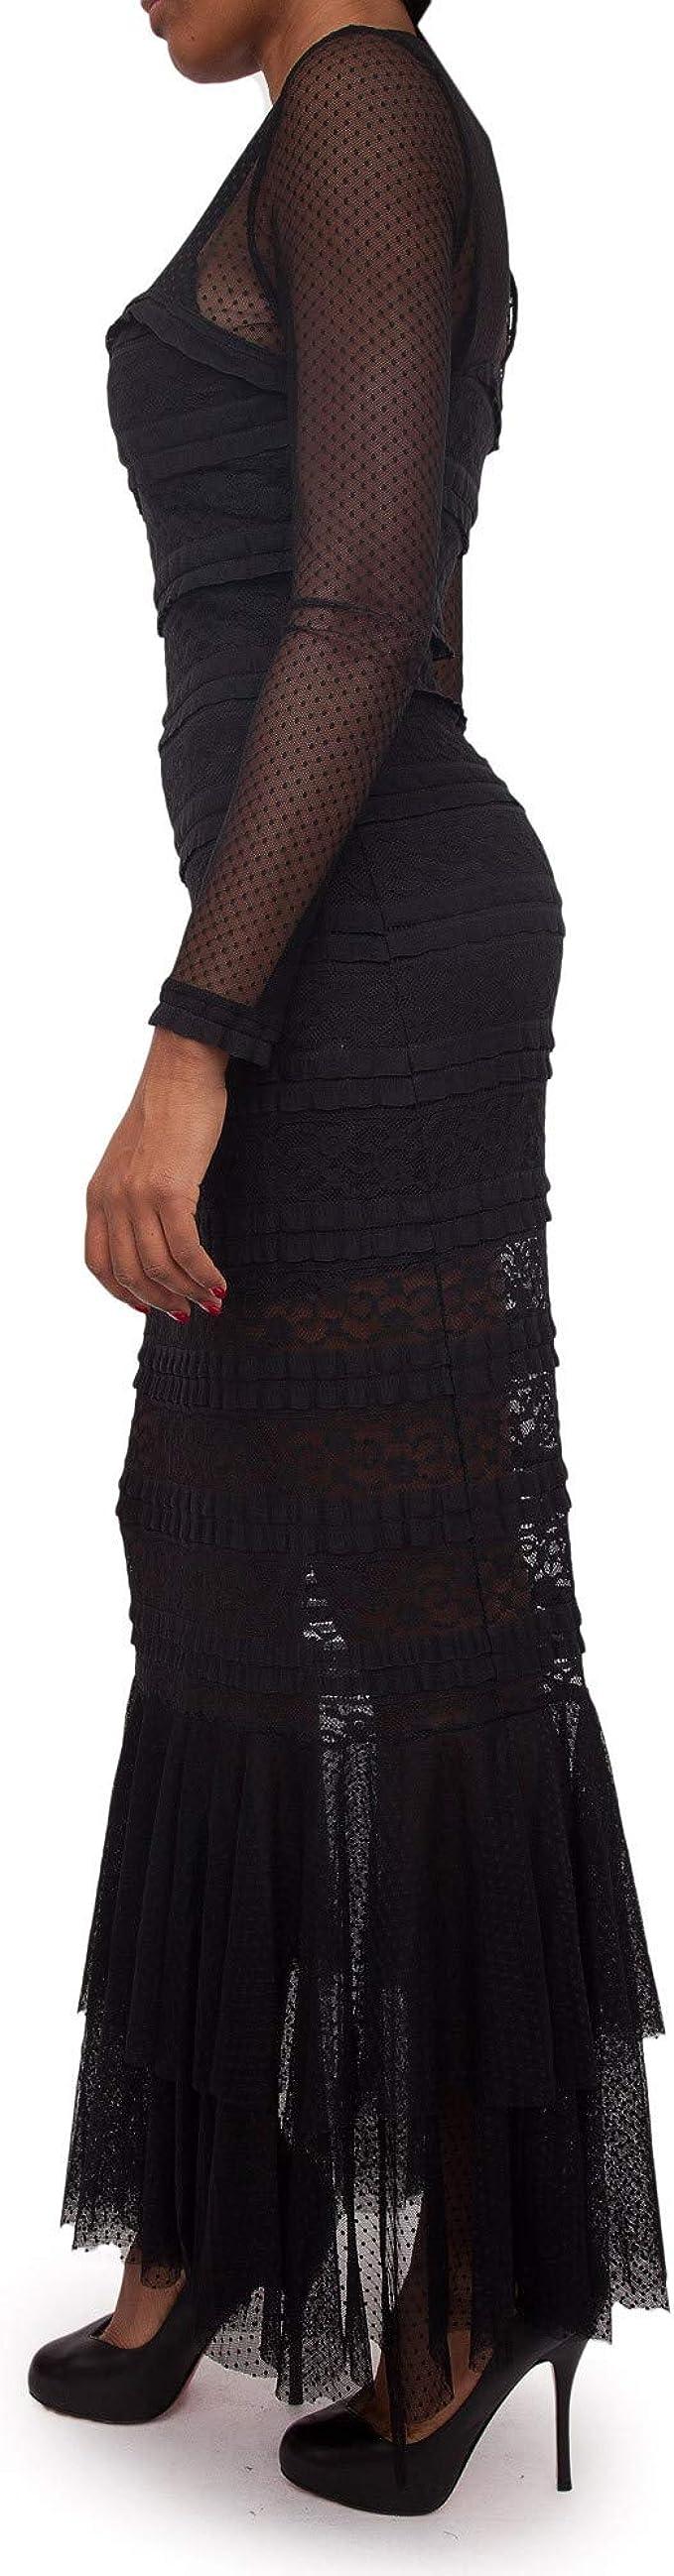 Guess Damen Kleid Betty Amazon De Bekleidung